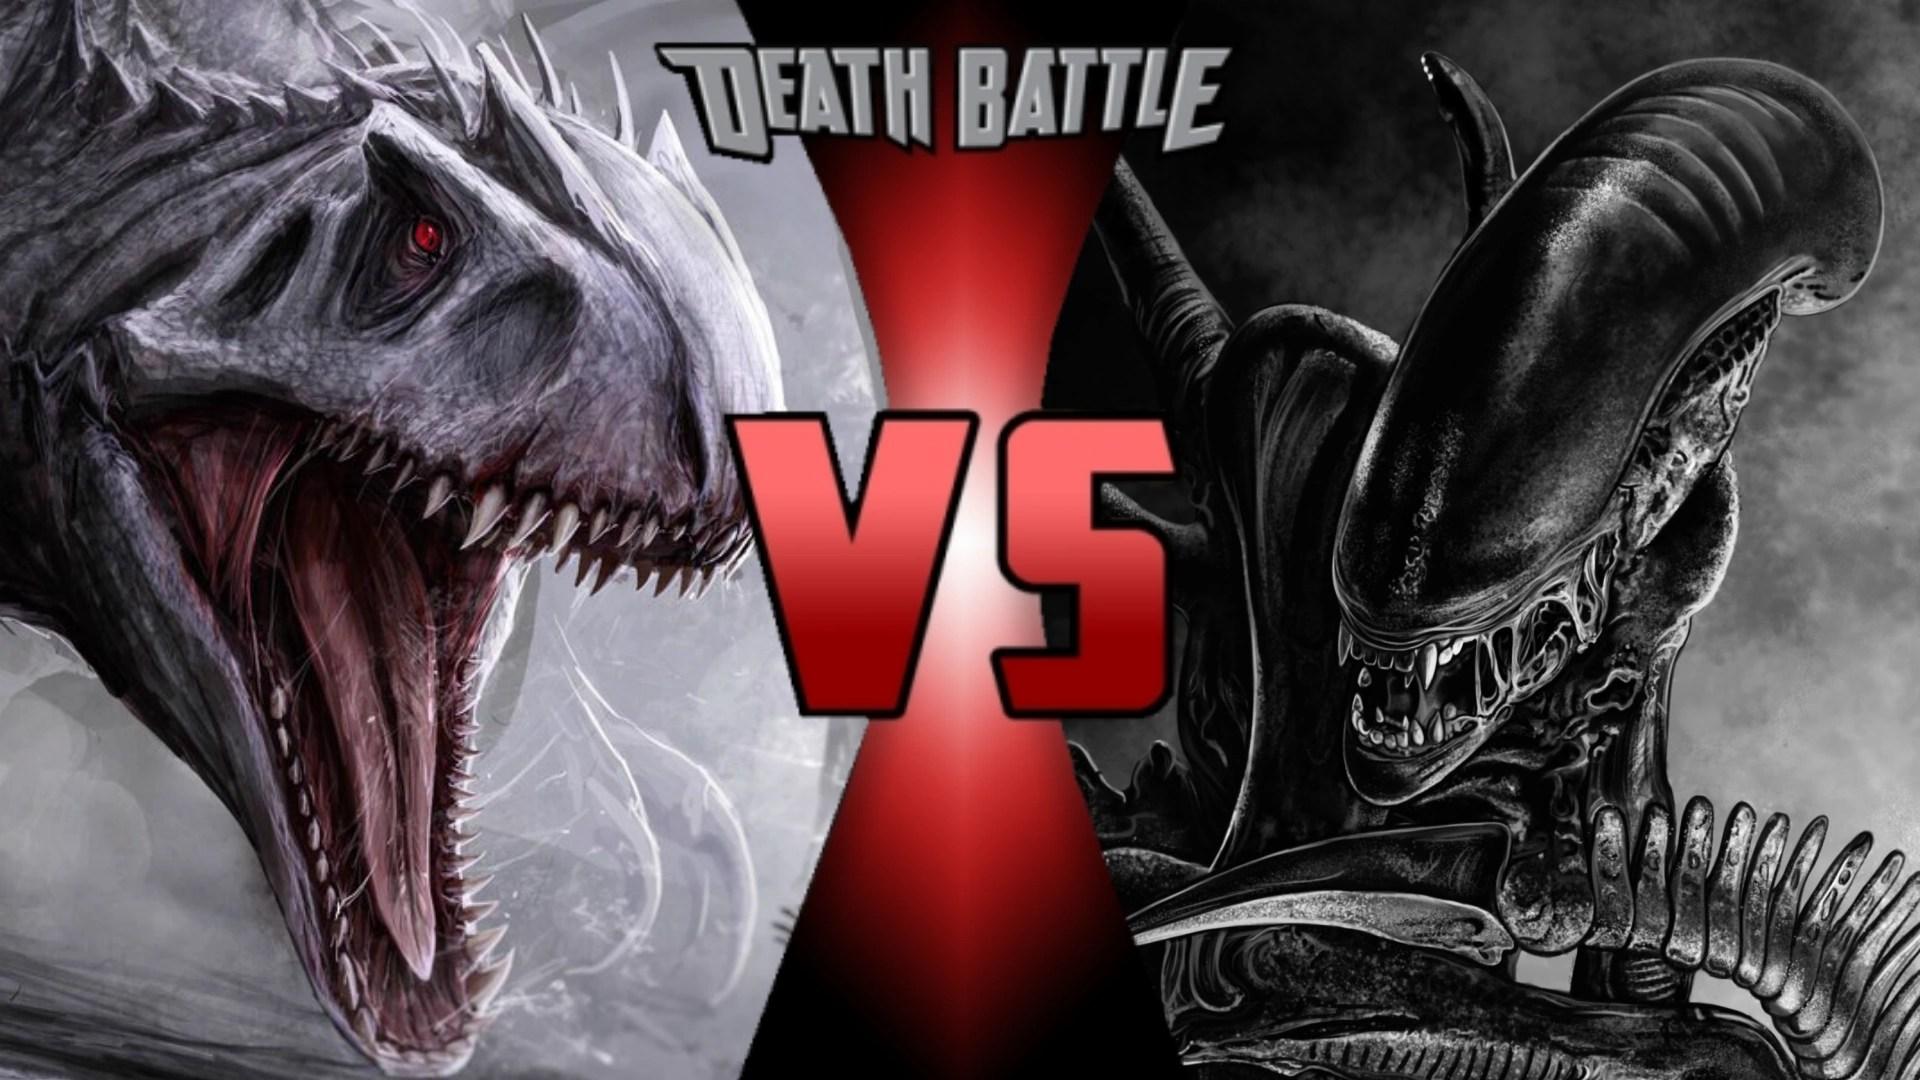 Monster University Wallpaper Hd Indominus Rex Vs Xenomorph Death Battle Fanon Wiki